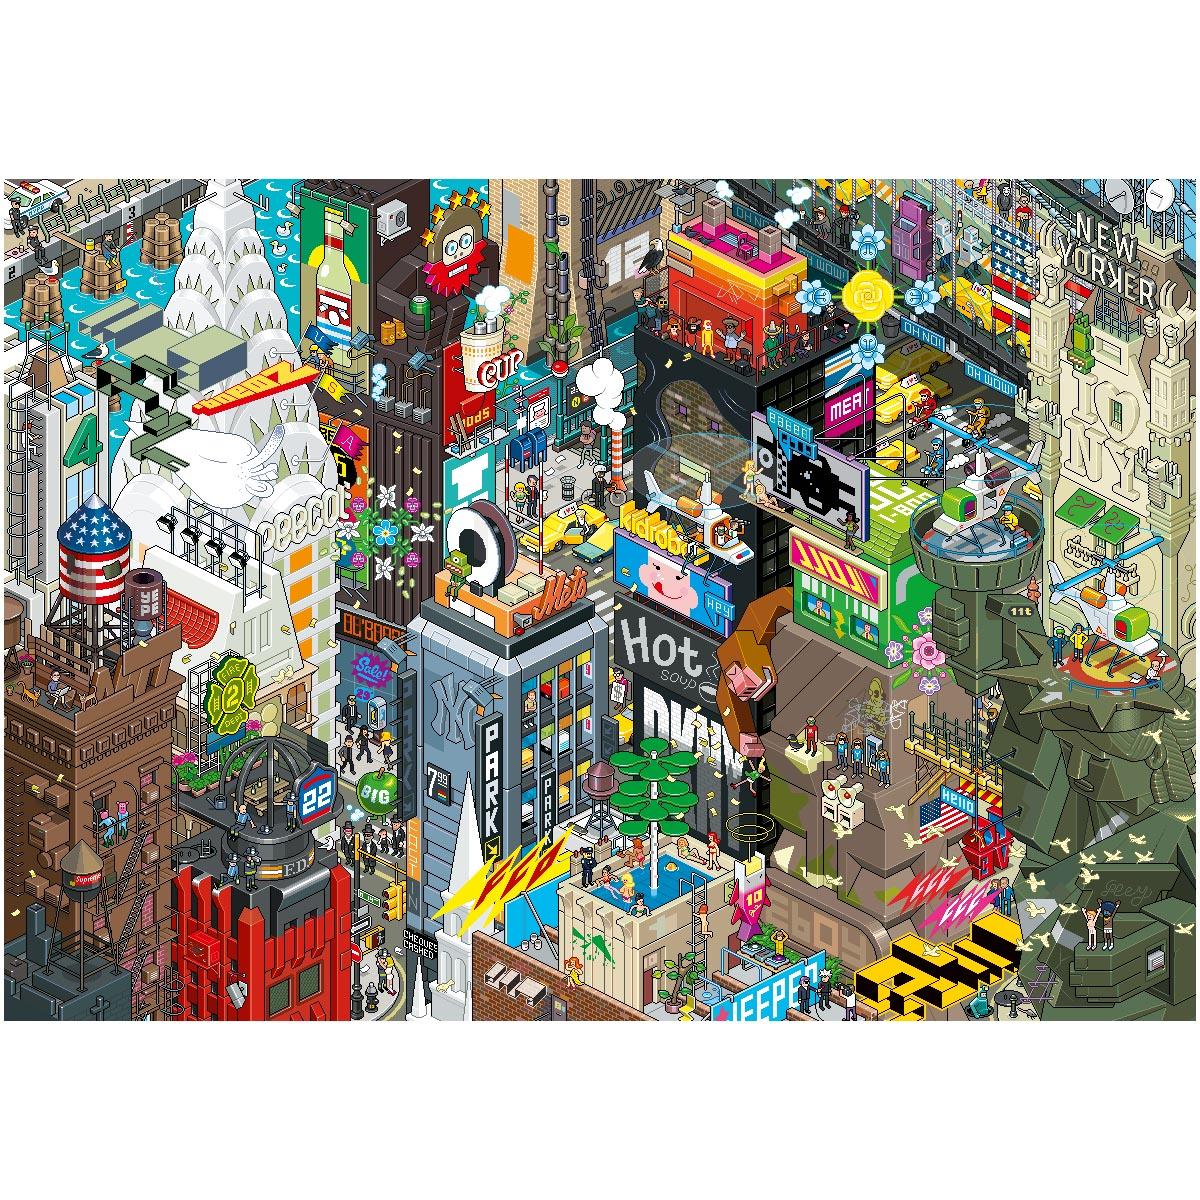 New York Pixel poster